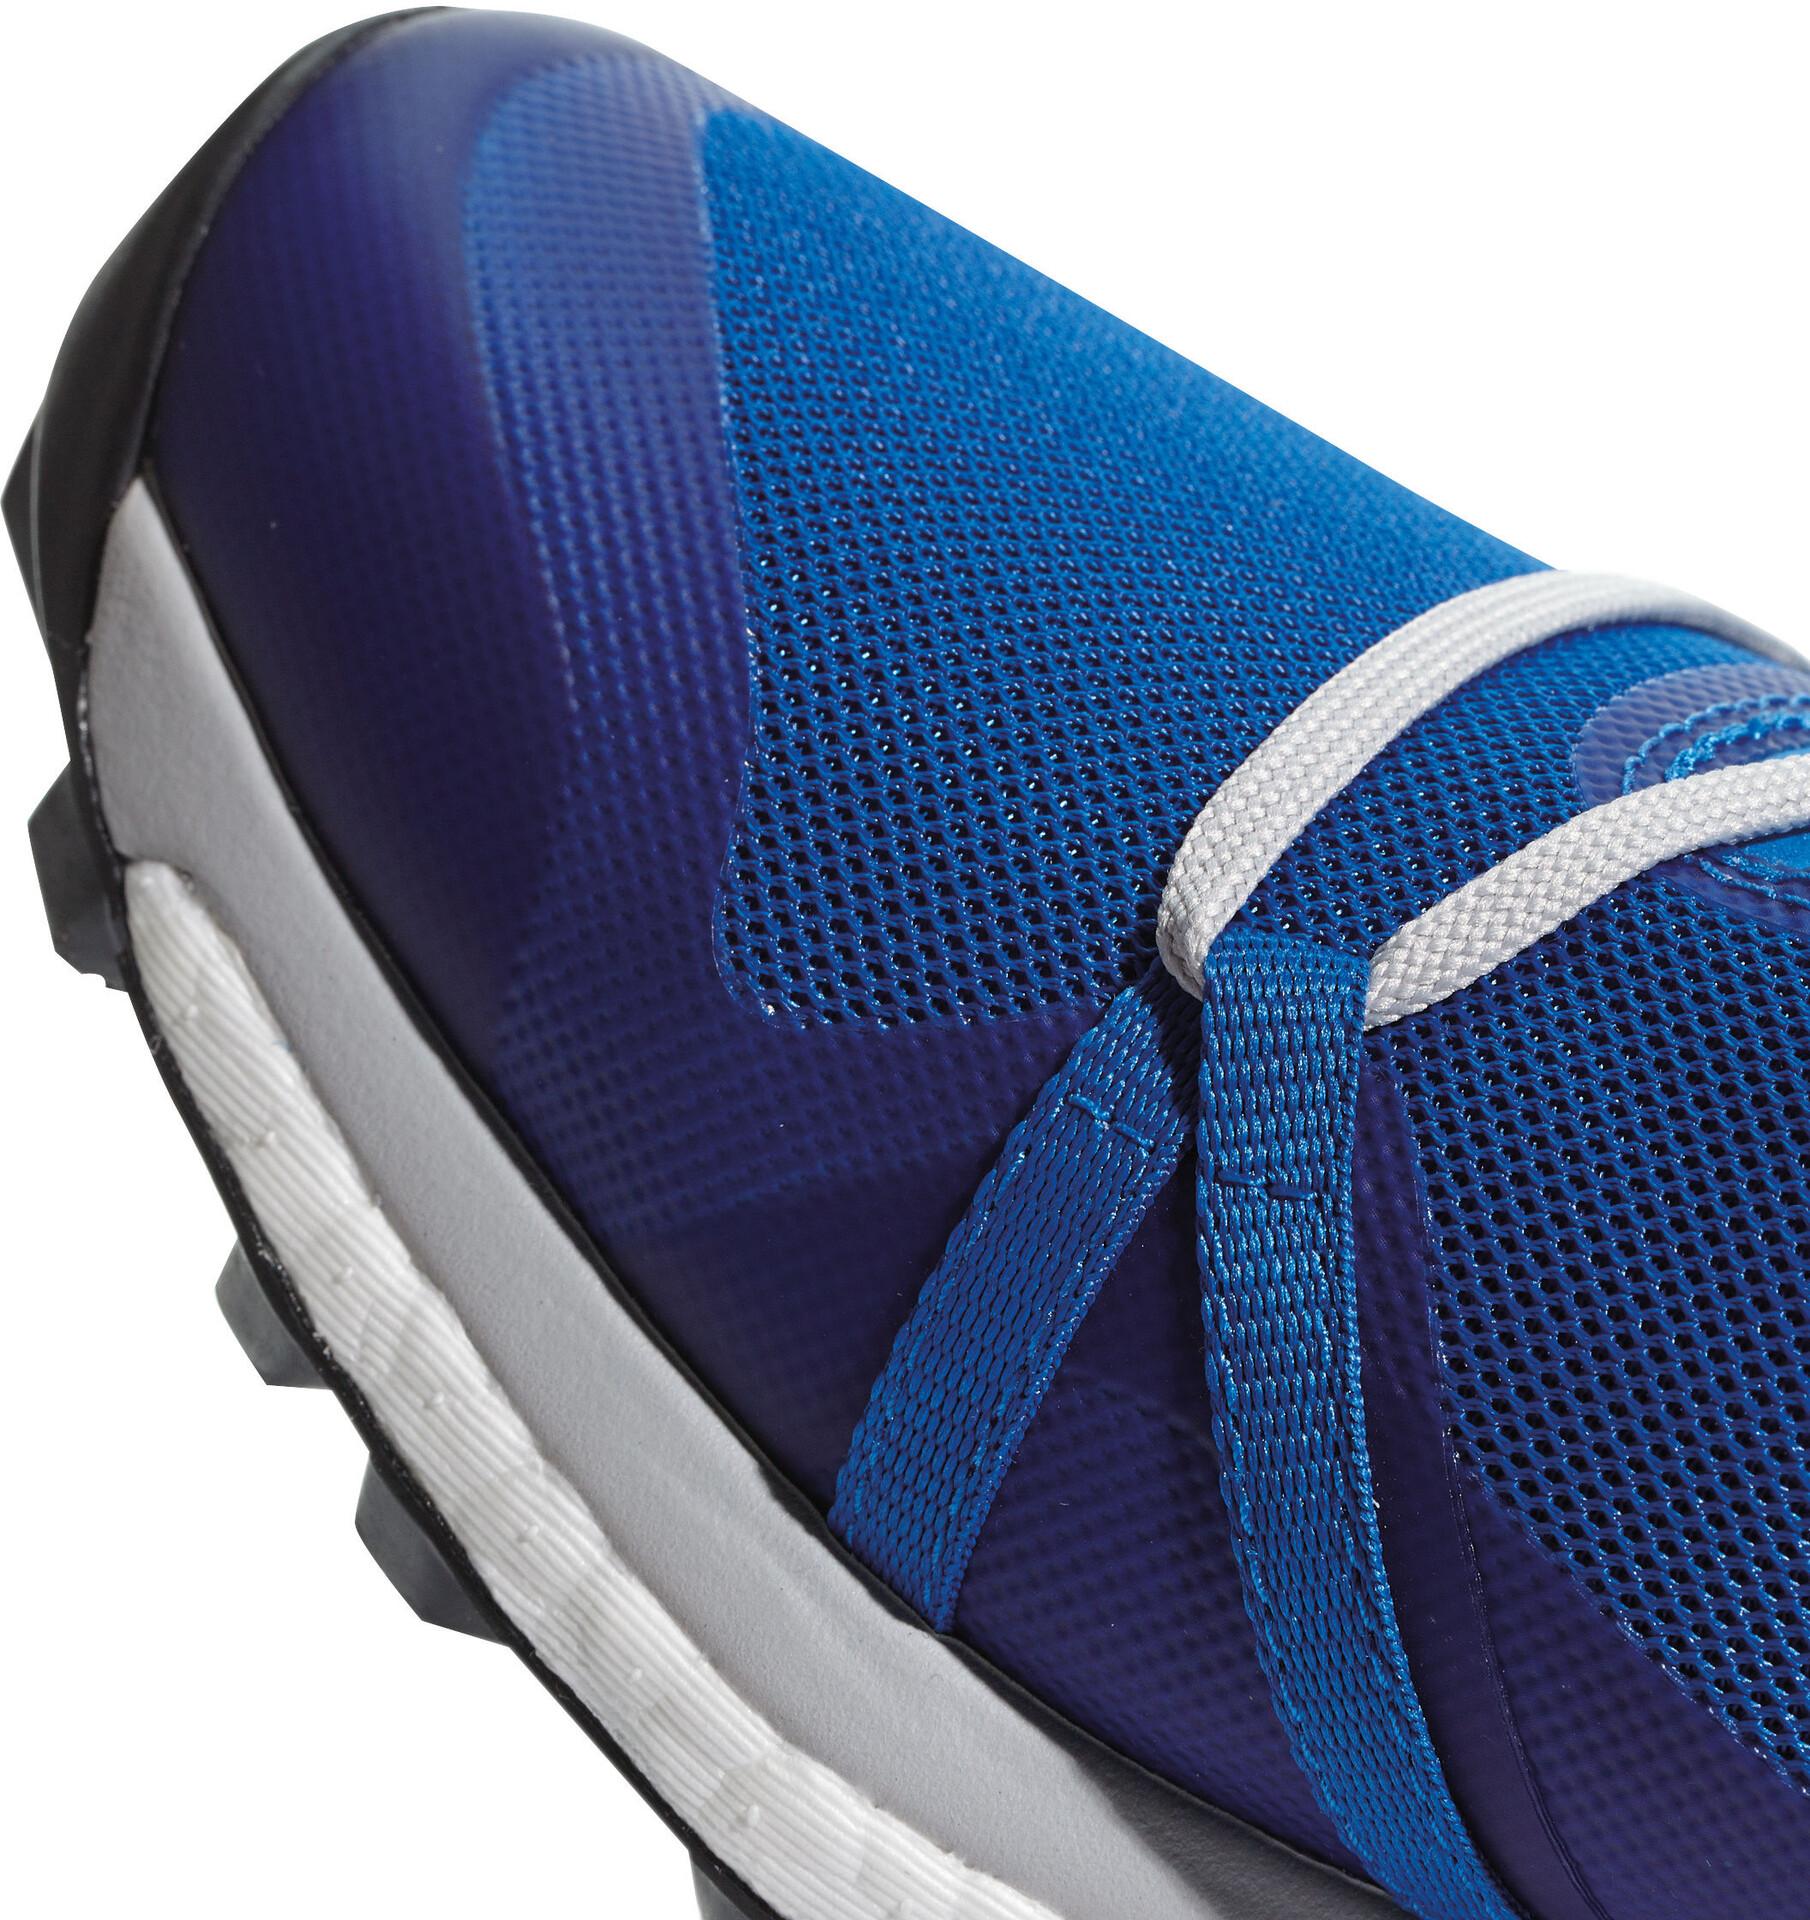 adidas TERREX Agravic Chaussures Homme, collegiate navyblue beautygrey two